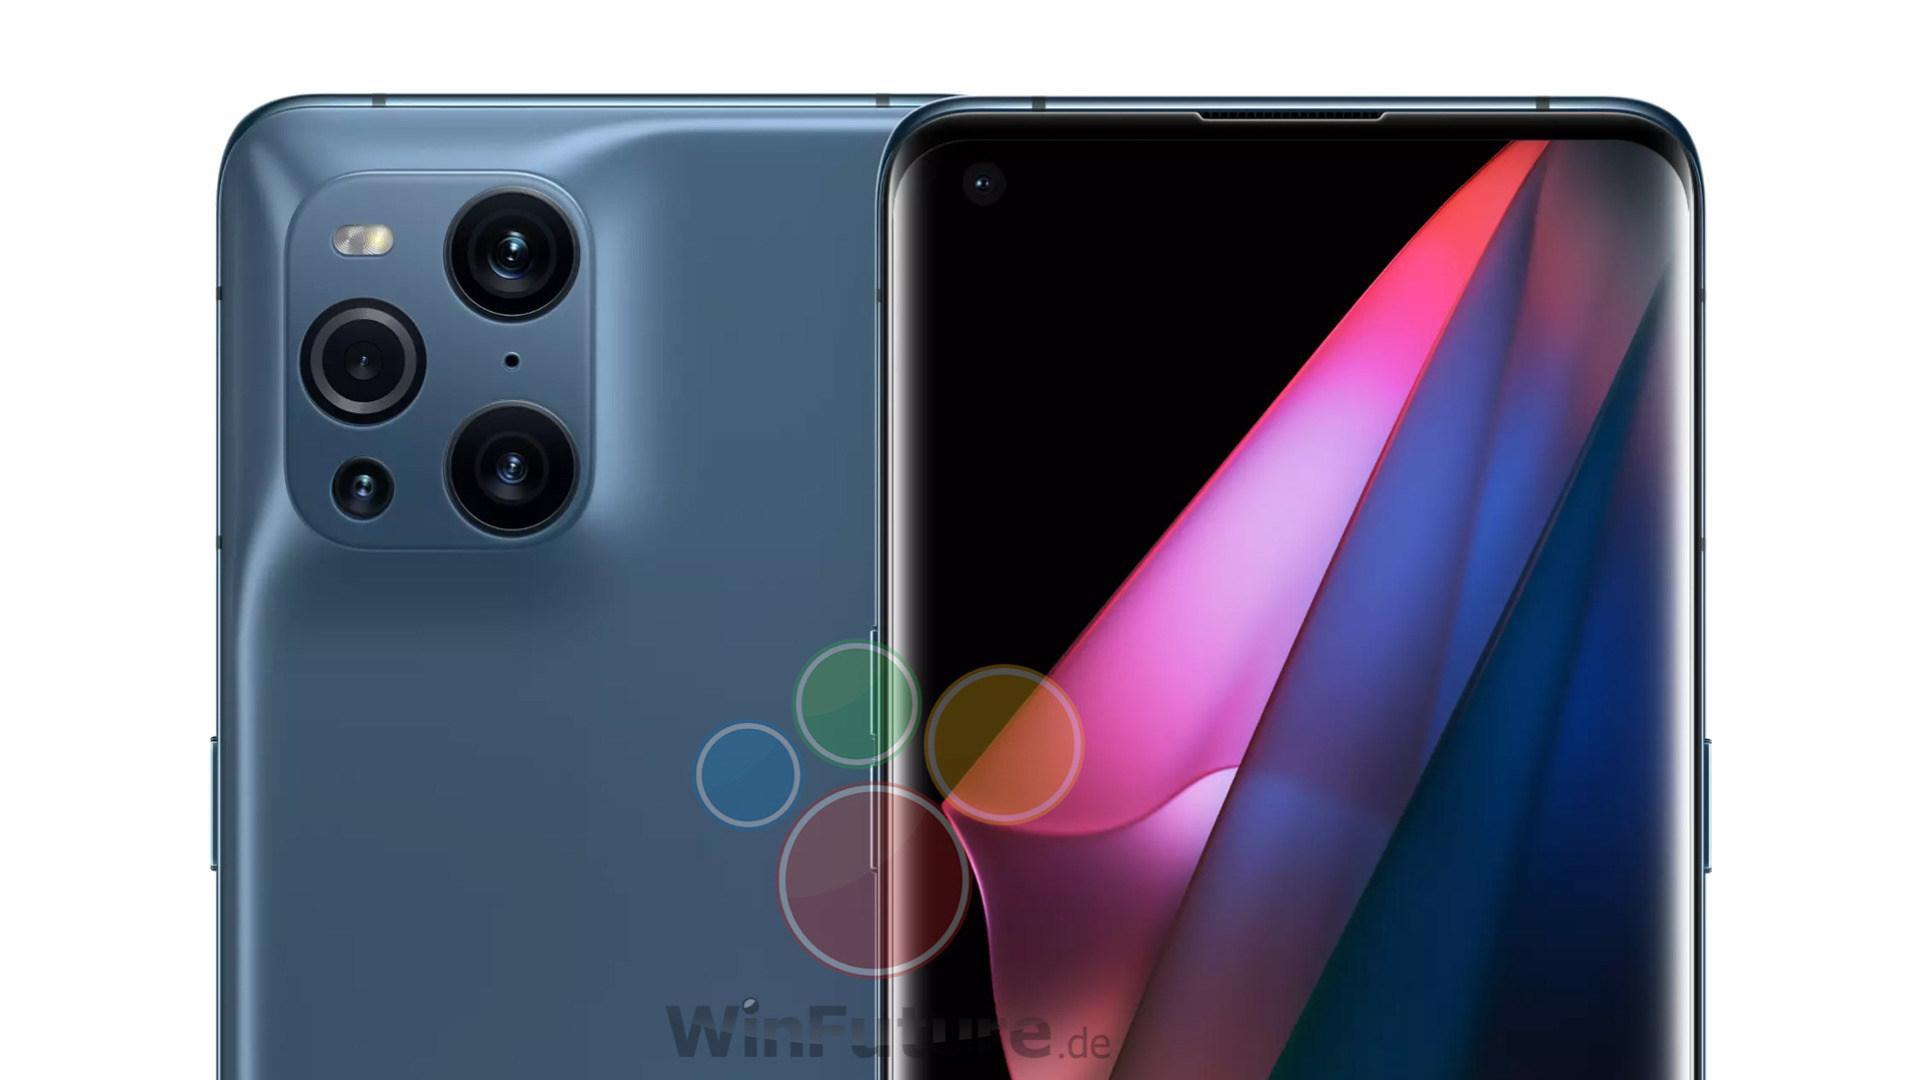 Smartphones, Kamera, Oppo, Quad-Kamera, Oppo Find X3 Pro